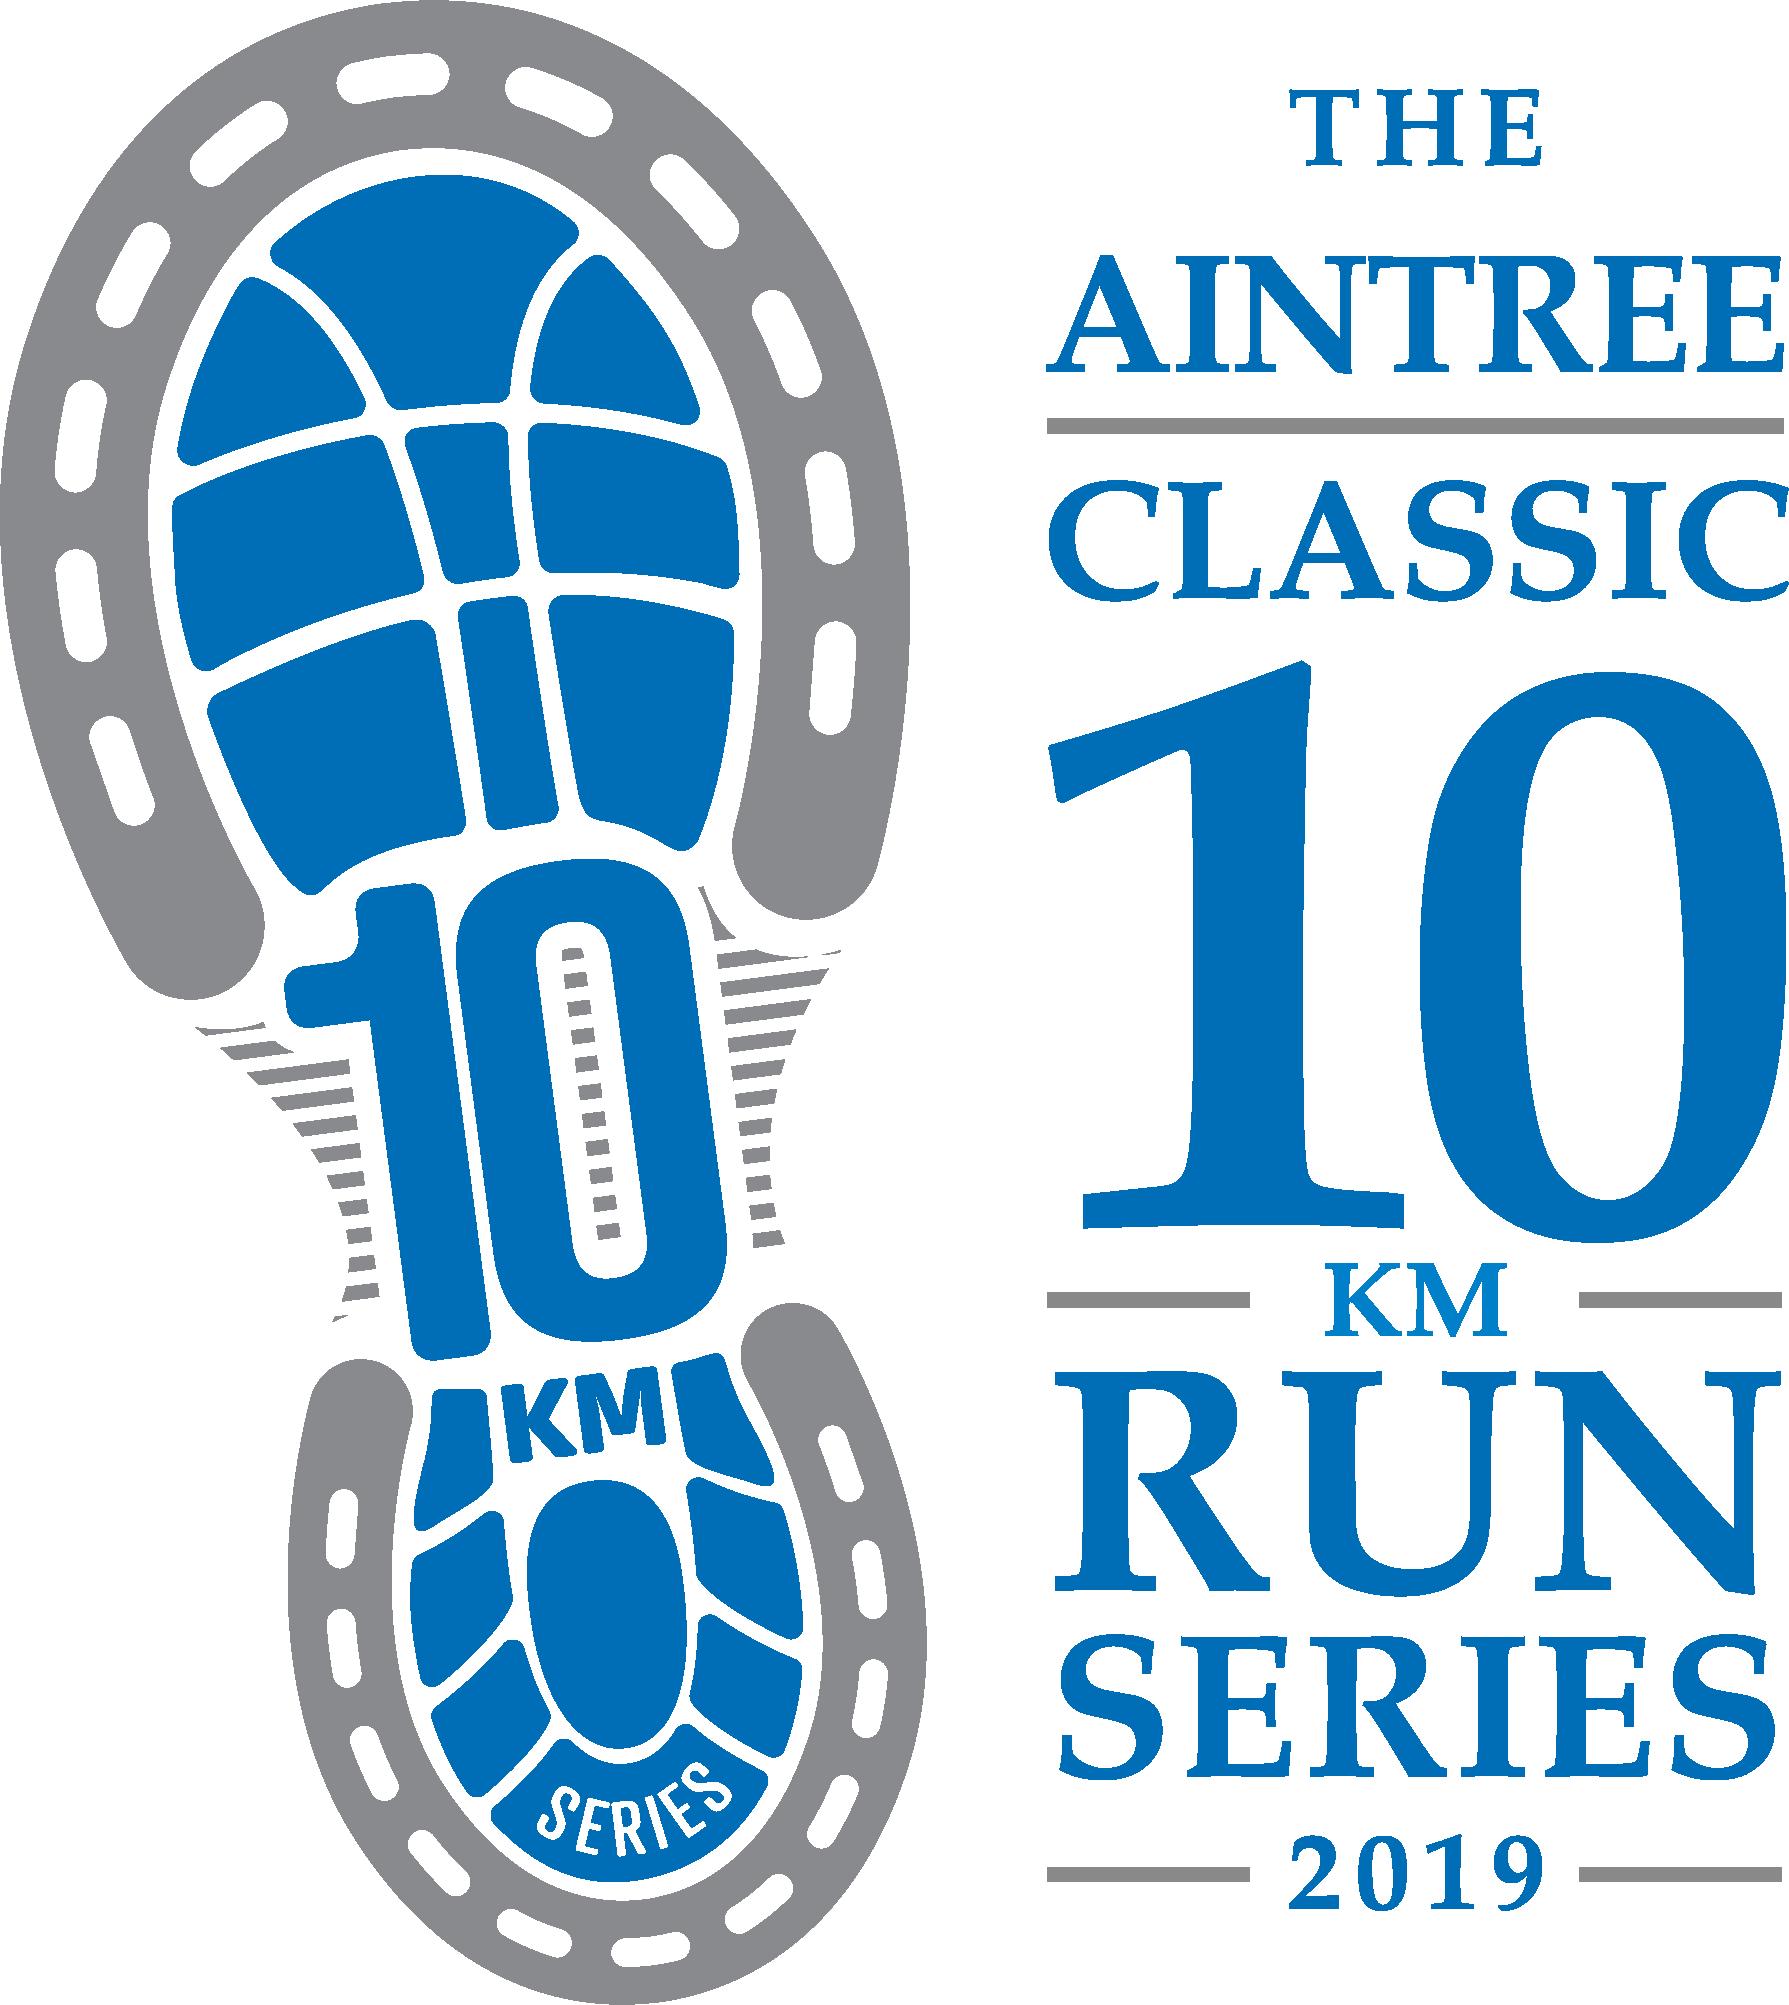 Aintry Georgia Map.The Aintree Classic Run 2019 Active